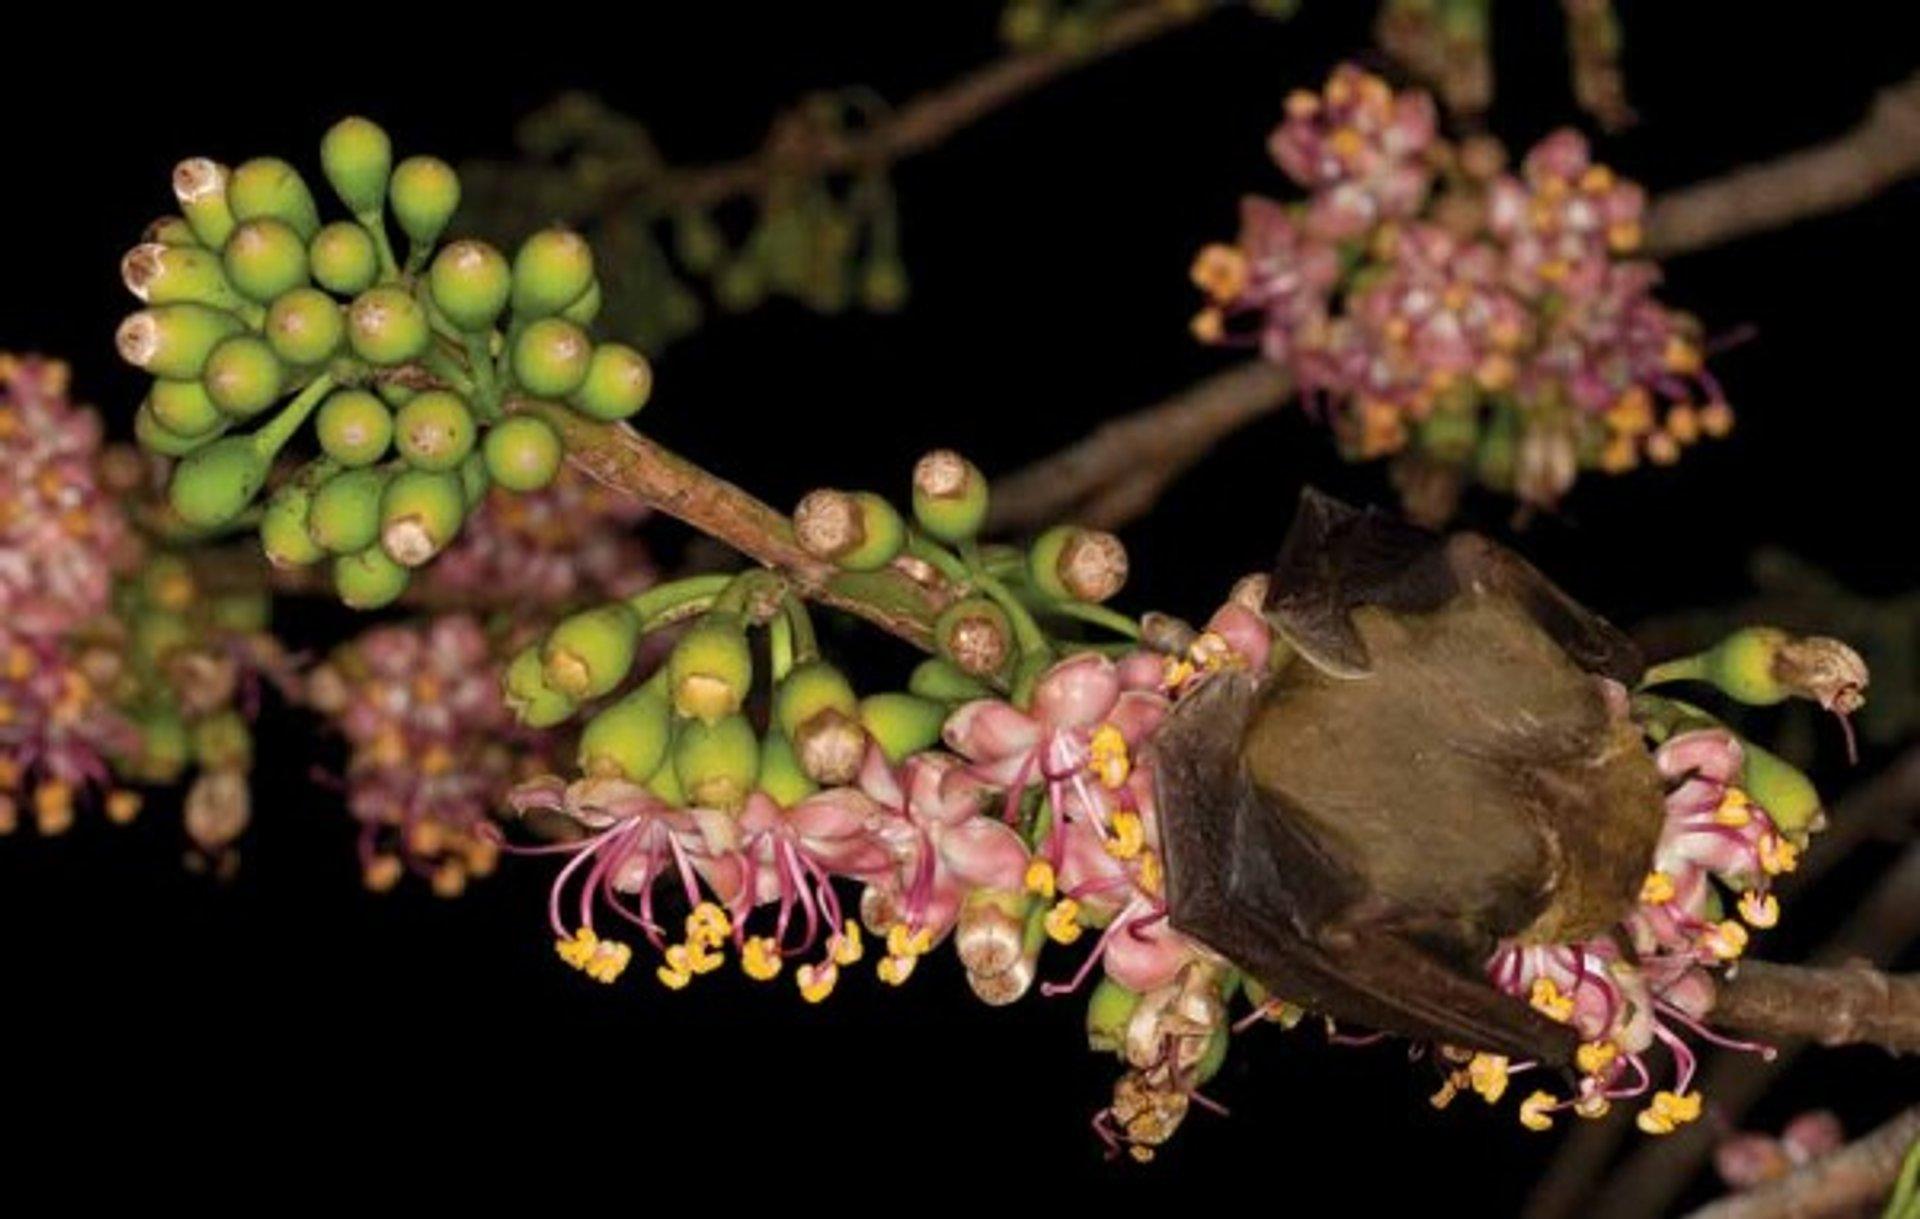 Ceiba Trees in Bloom in Guatemala - Best Time